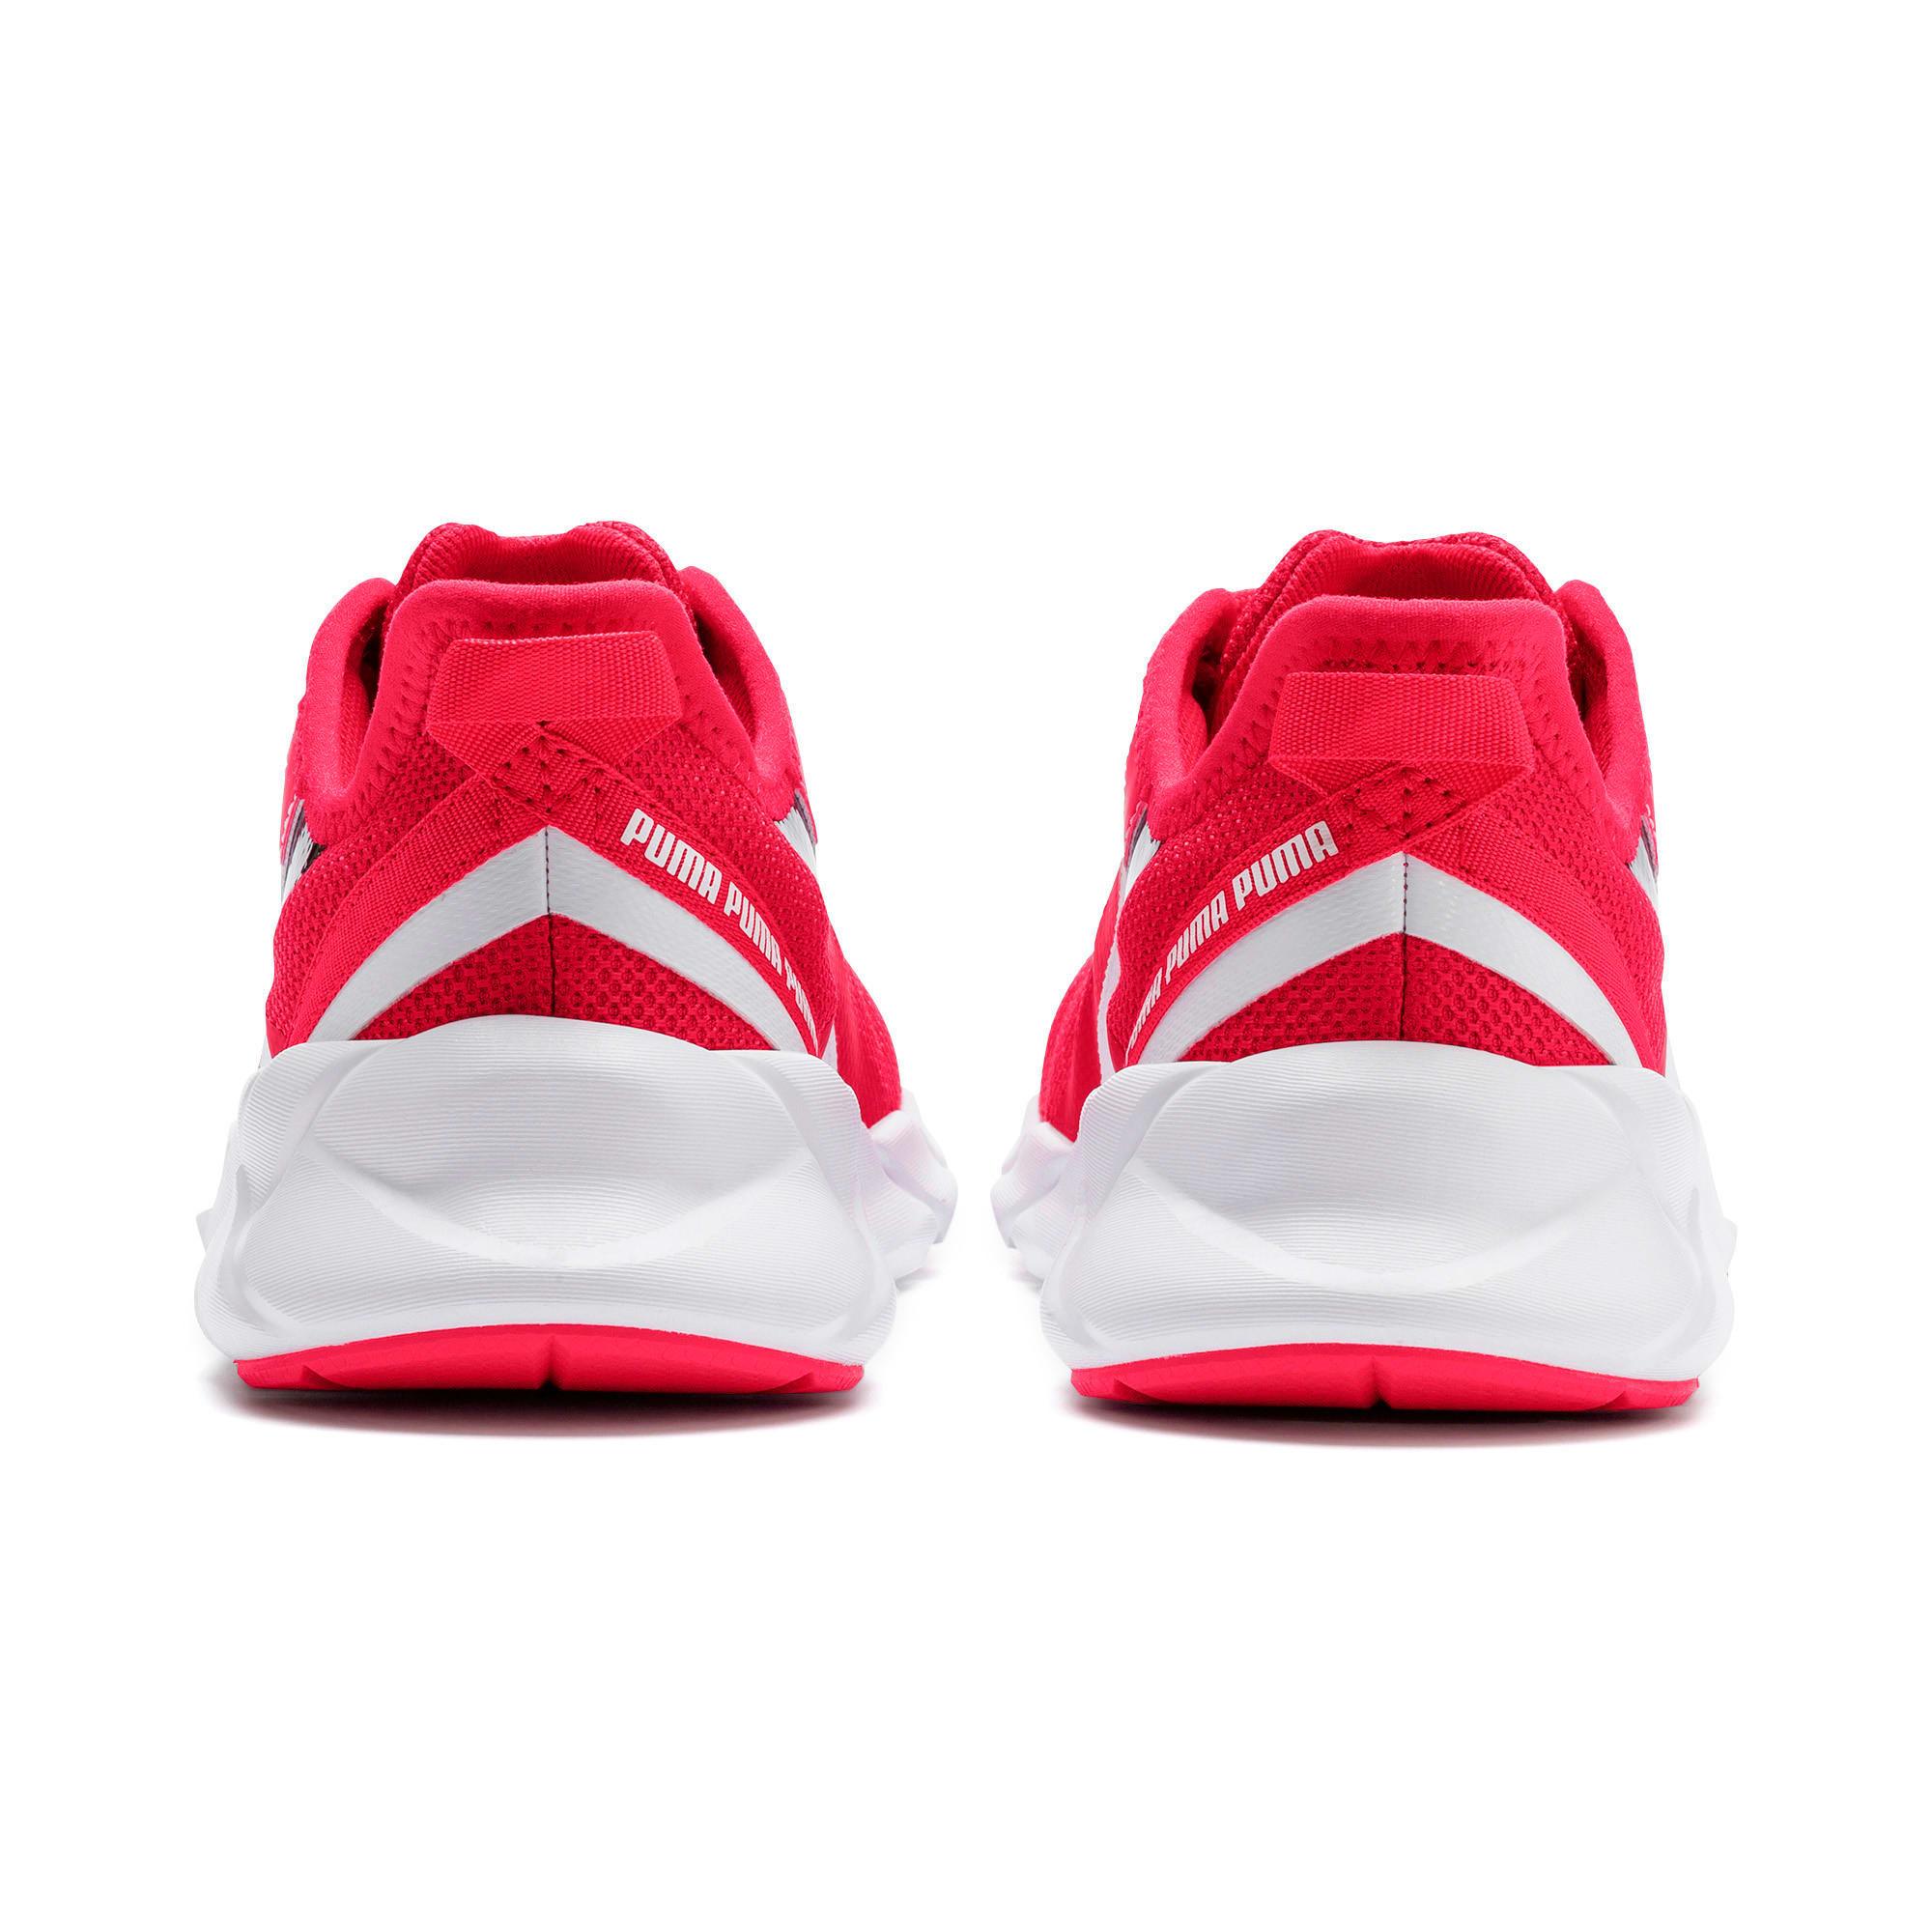 Thumbnail 4 of Weave XT Shift Women's Training Shoes, Nrgy Rose-Puma White, medium